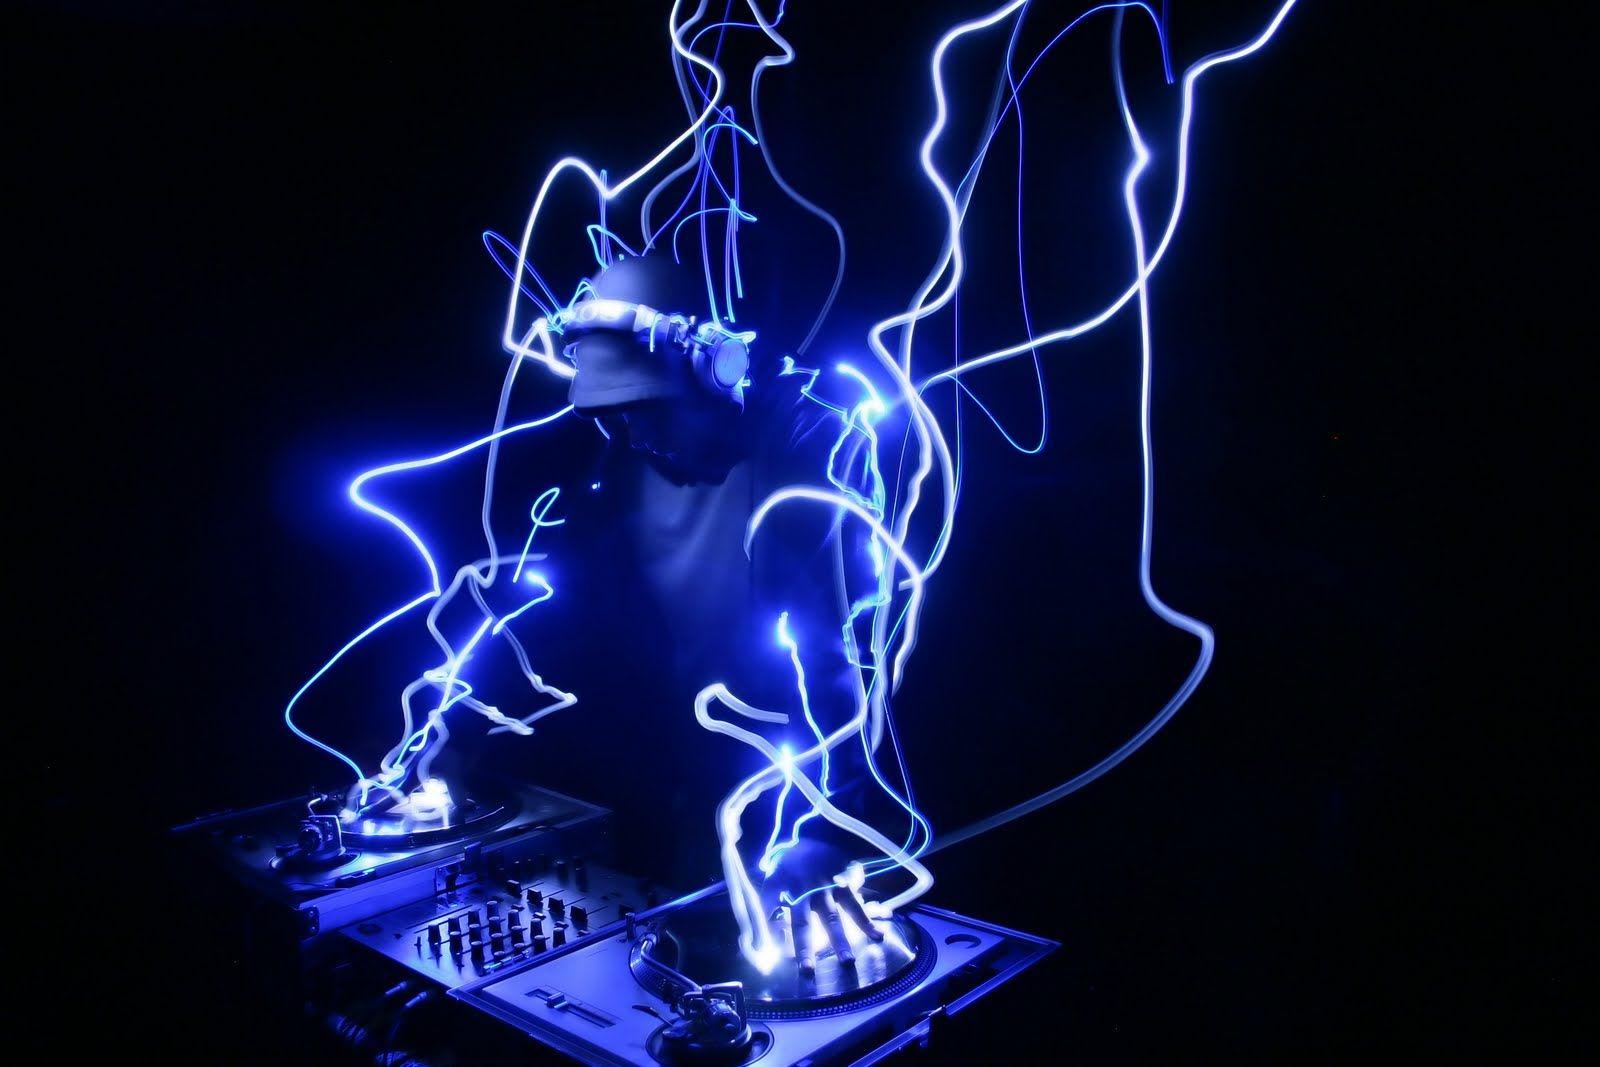 electro music background electro music background